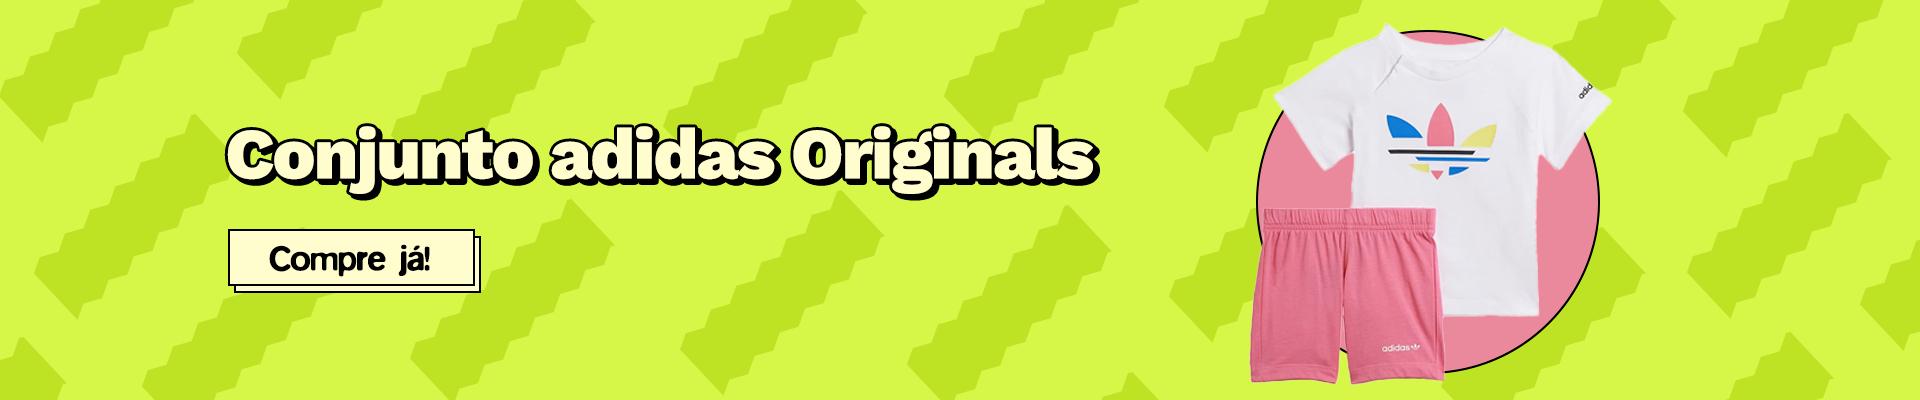 b2-conjunto-adidas-originals